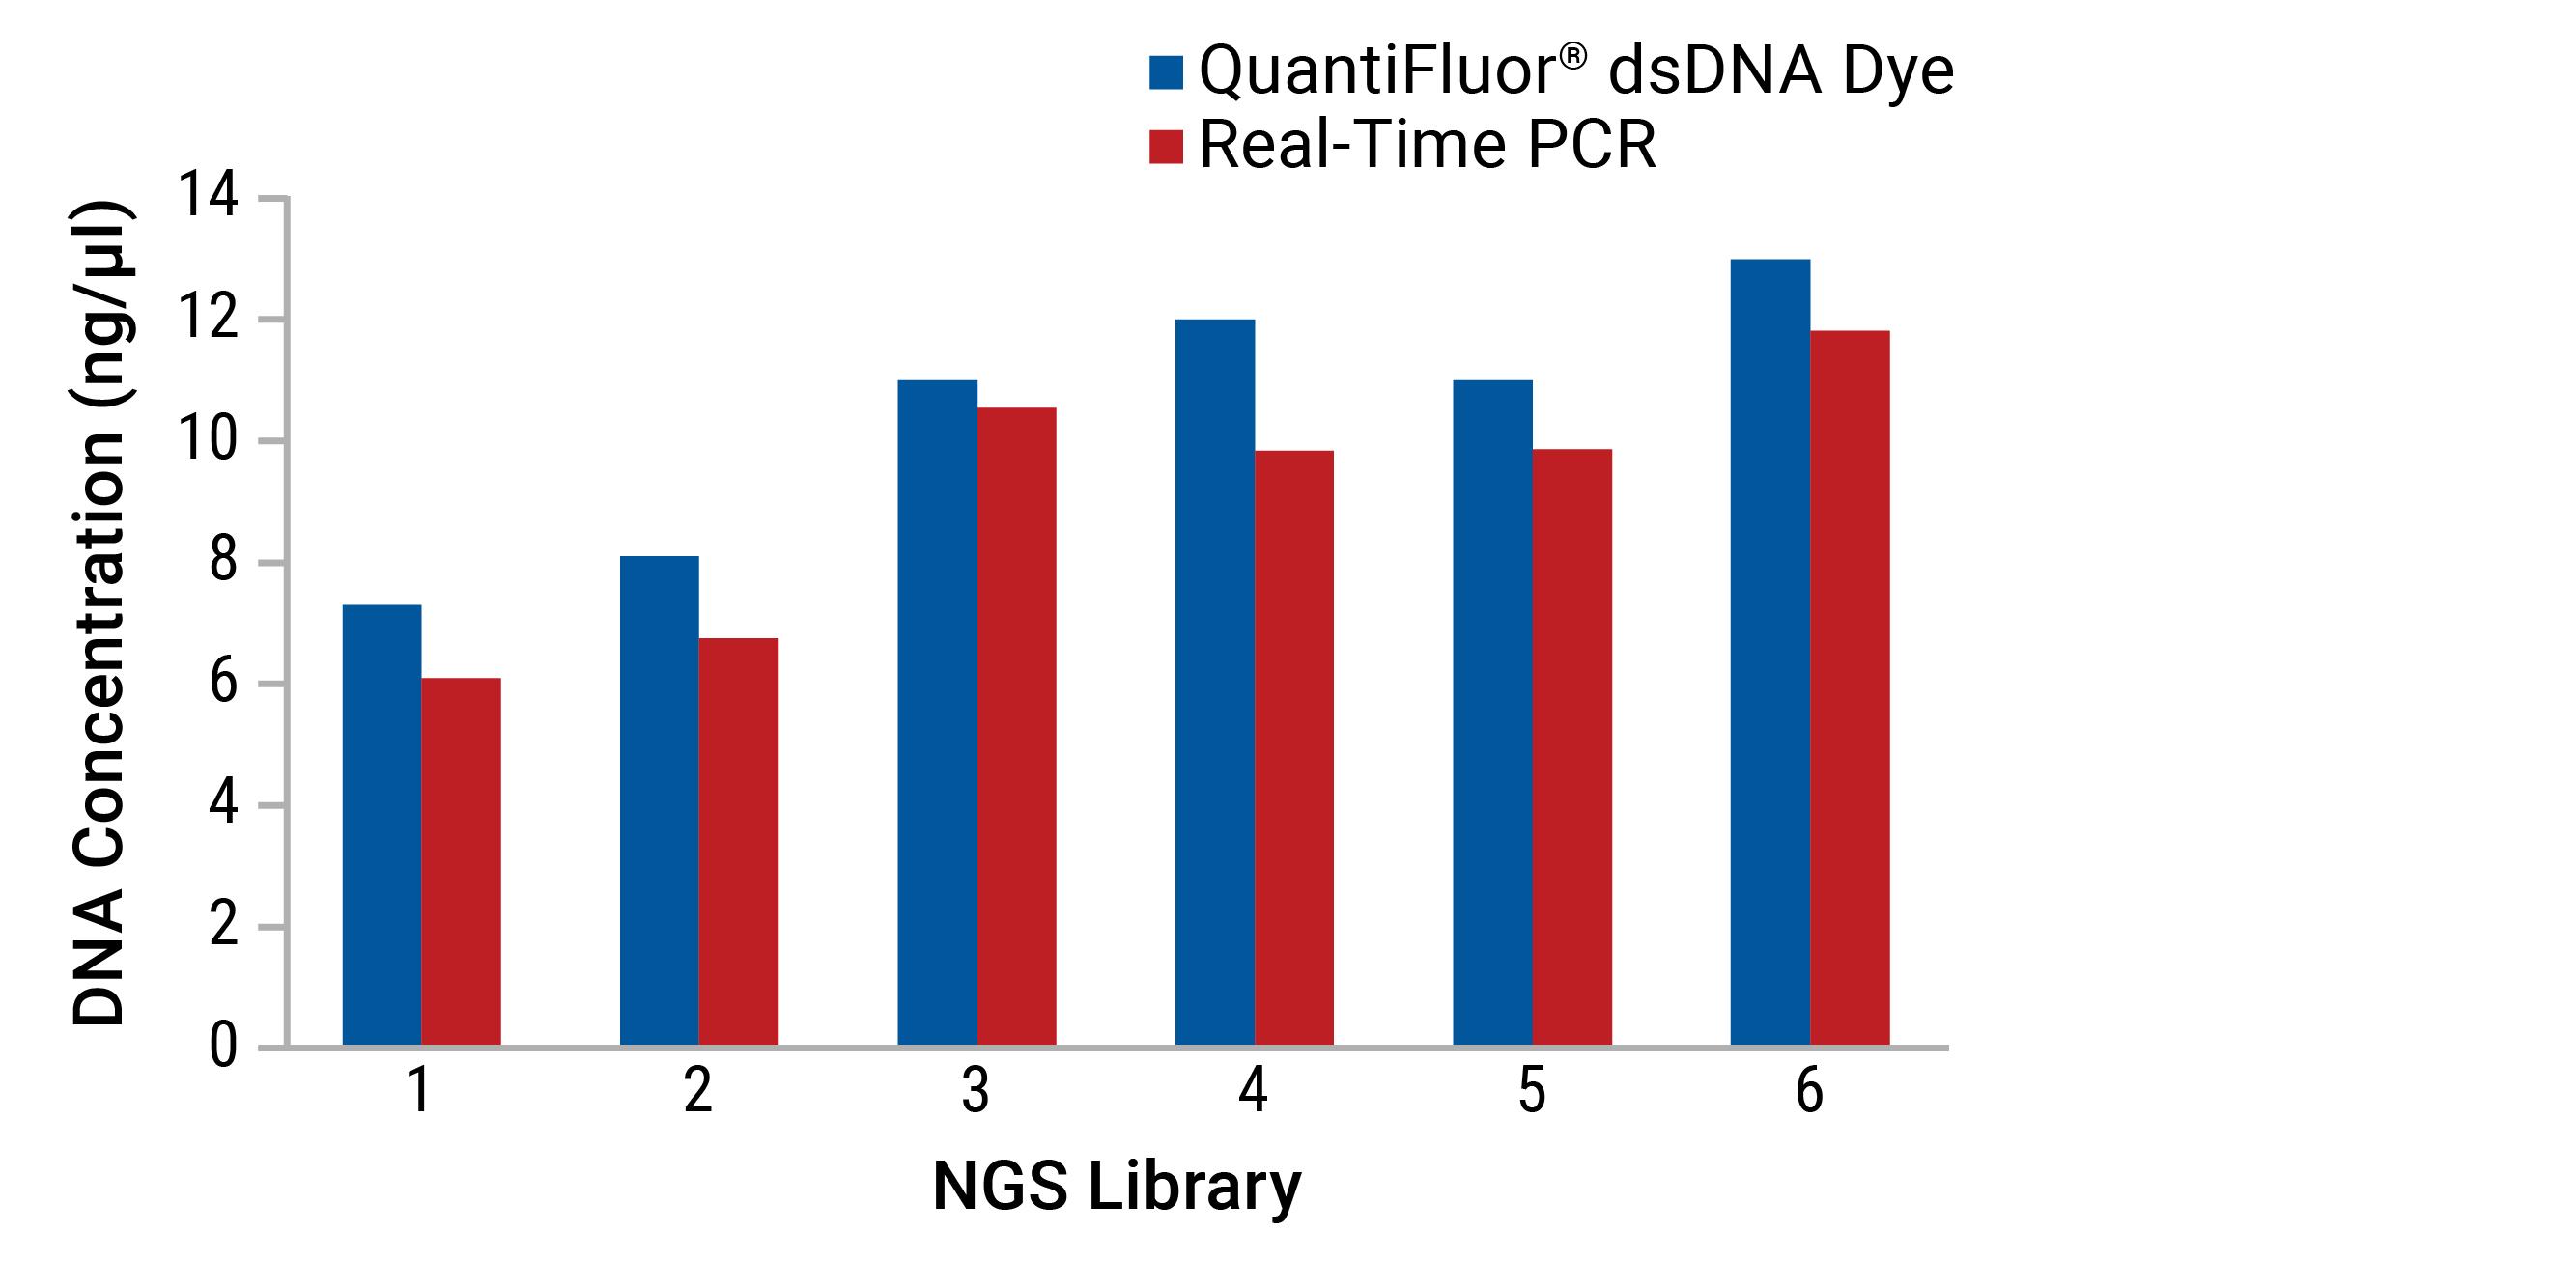 Choosing the Right Method for Nucleic Acid Quantitation